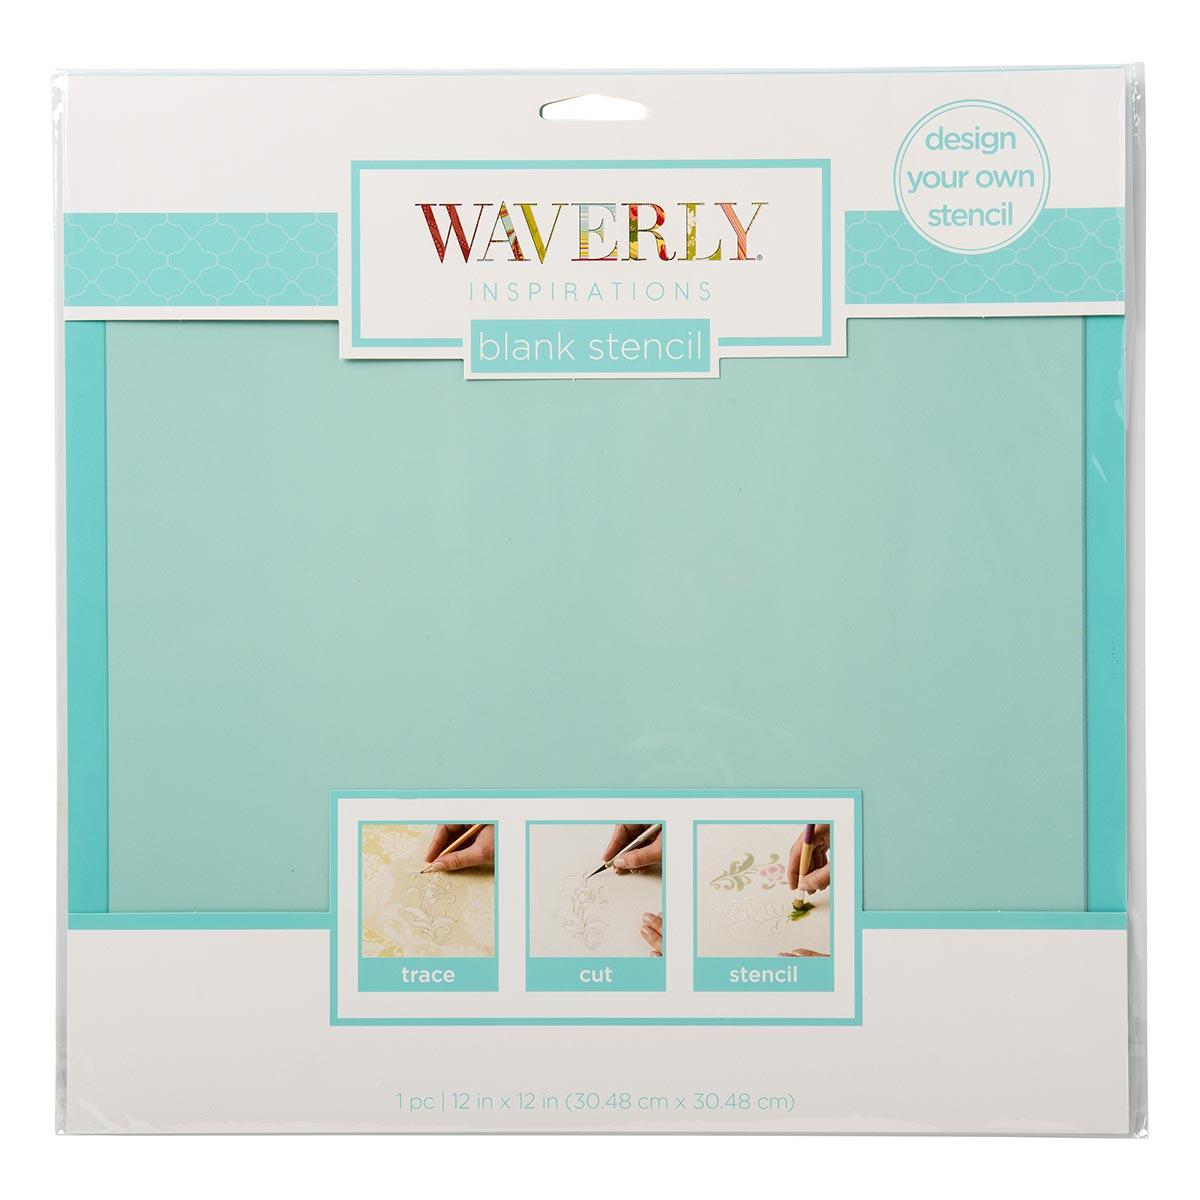 Waverly ® Inspirations Laser Stencils - Blank, 12